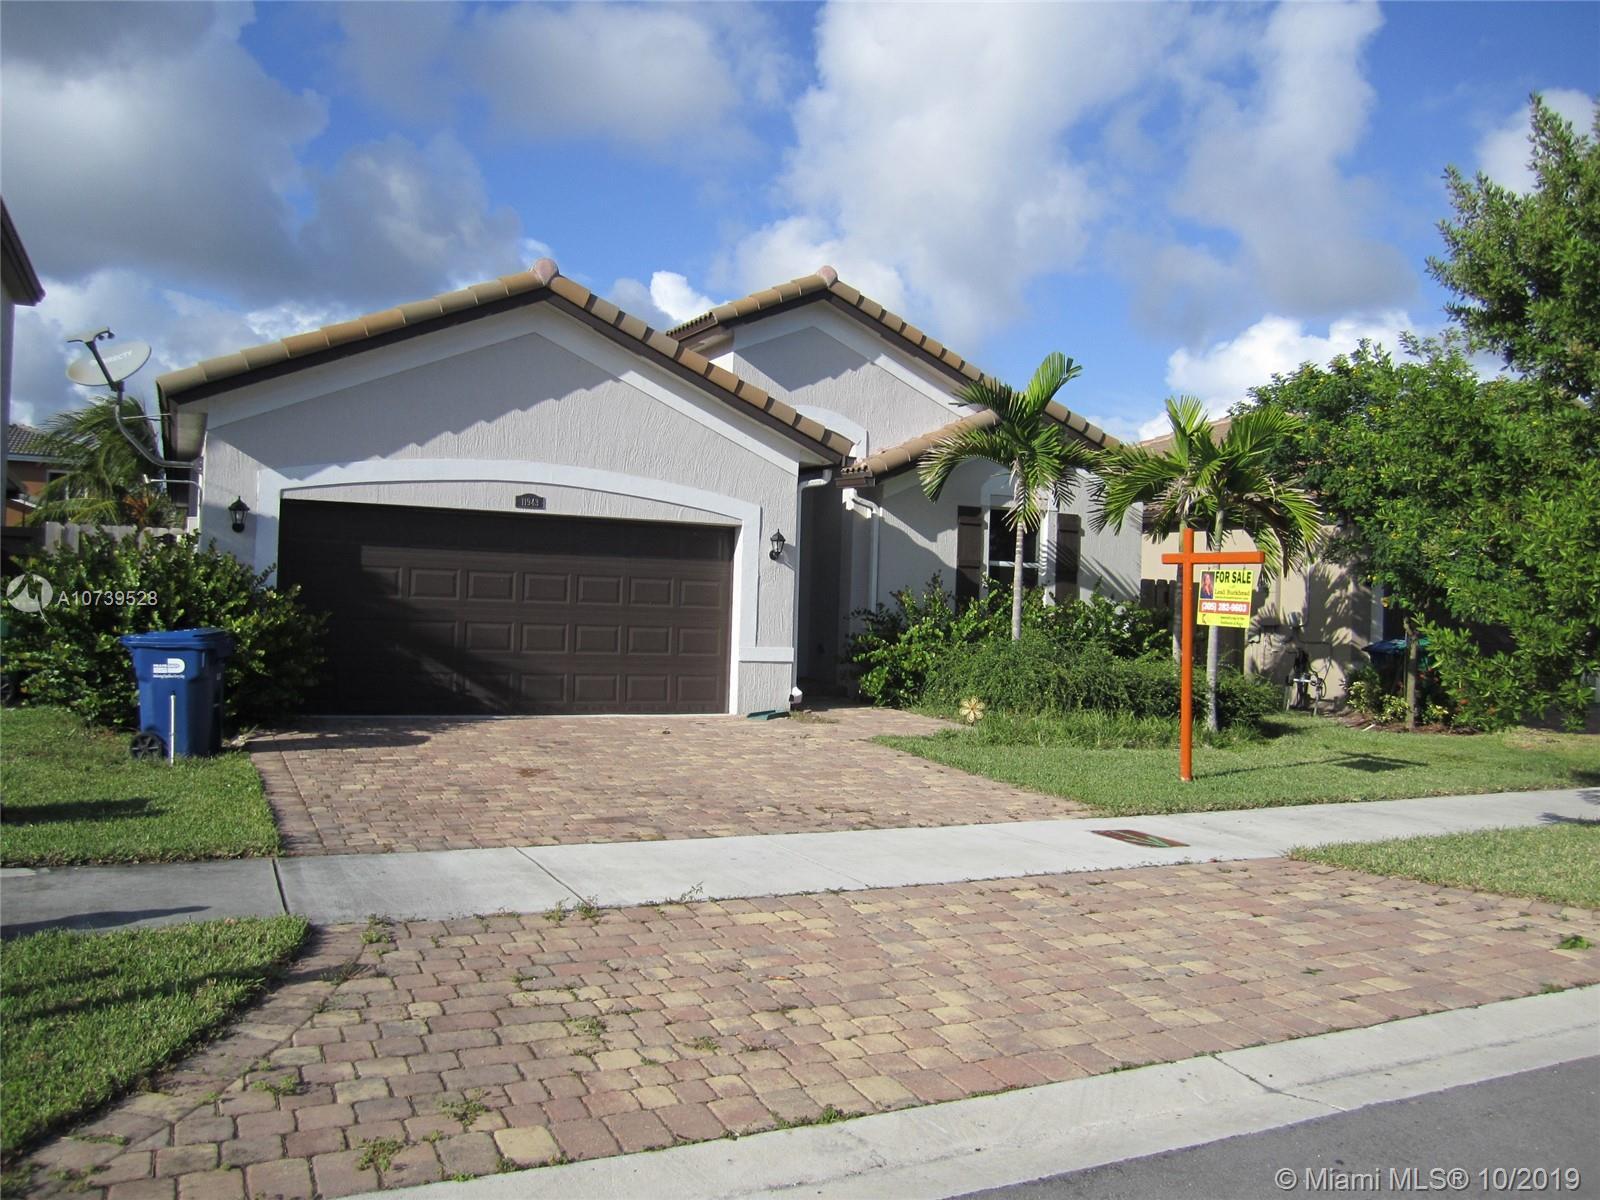 11943 SW 253rd St, Homestead, FL 33032 - Homestead, FL real estate listing